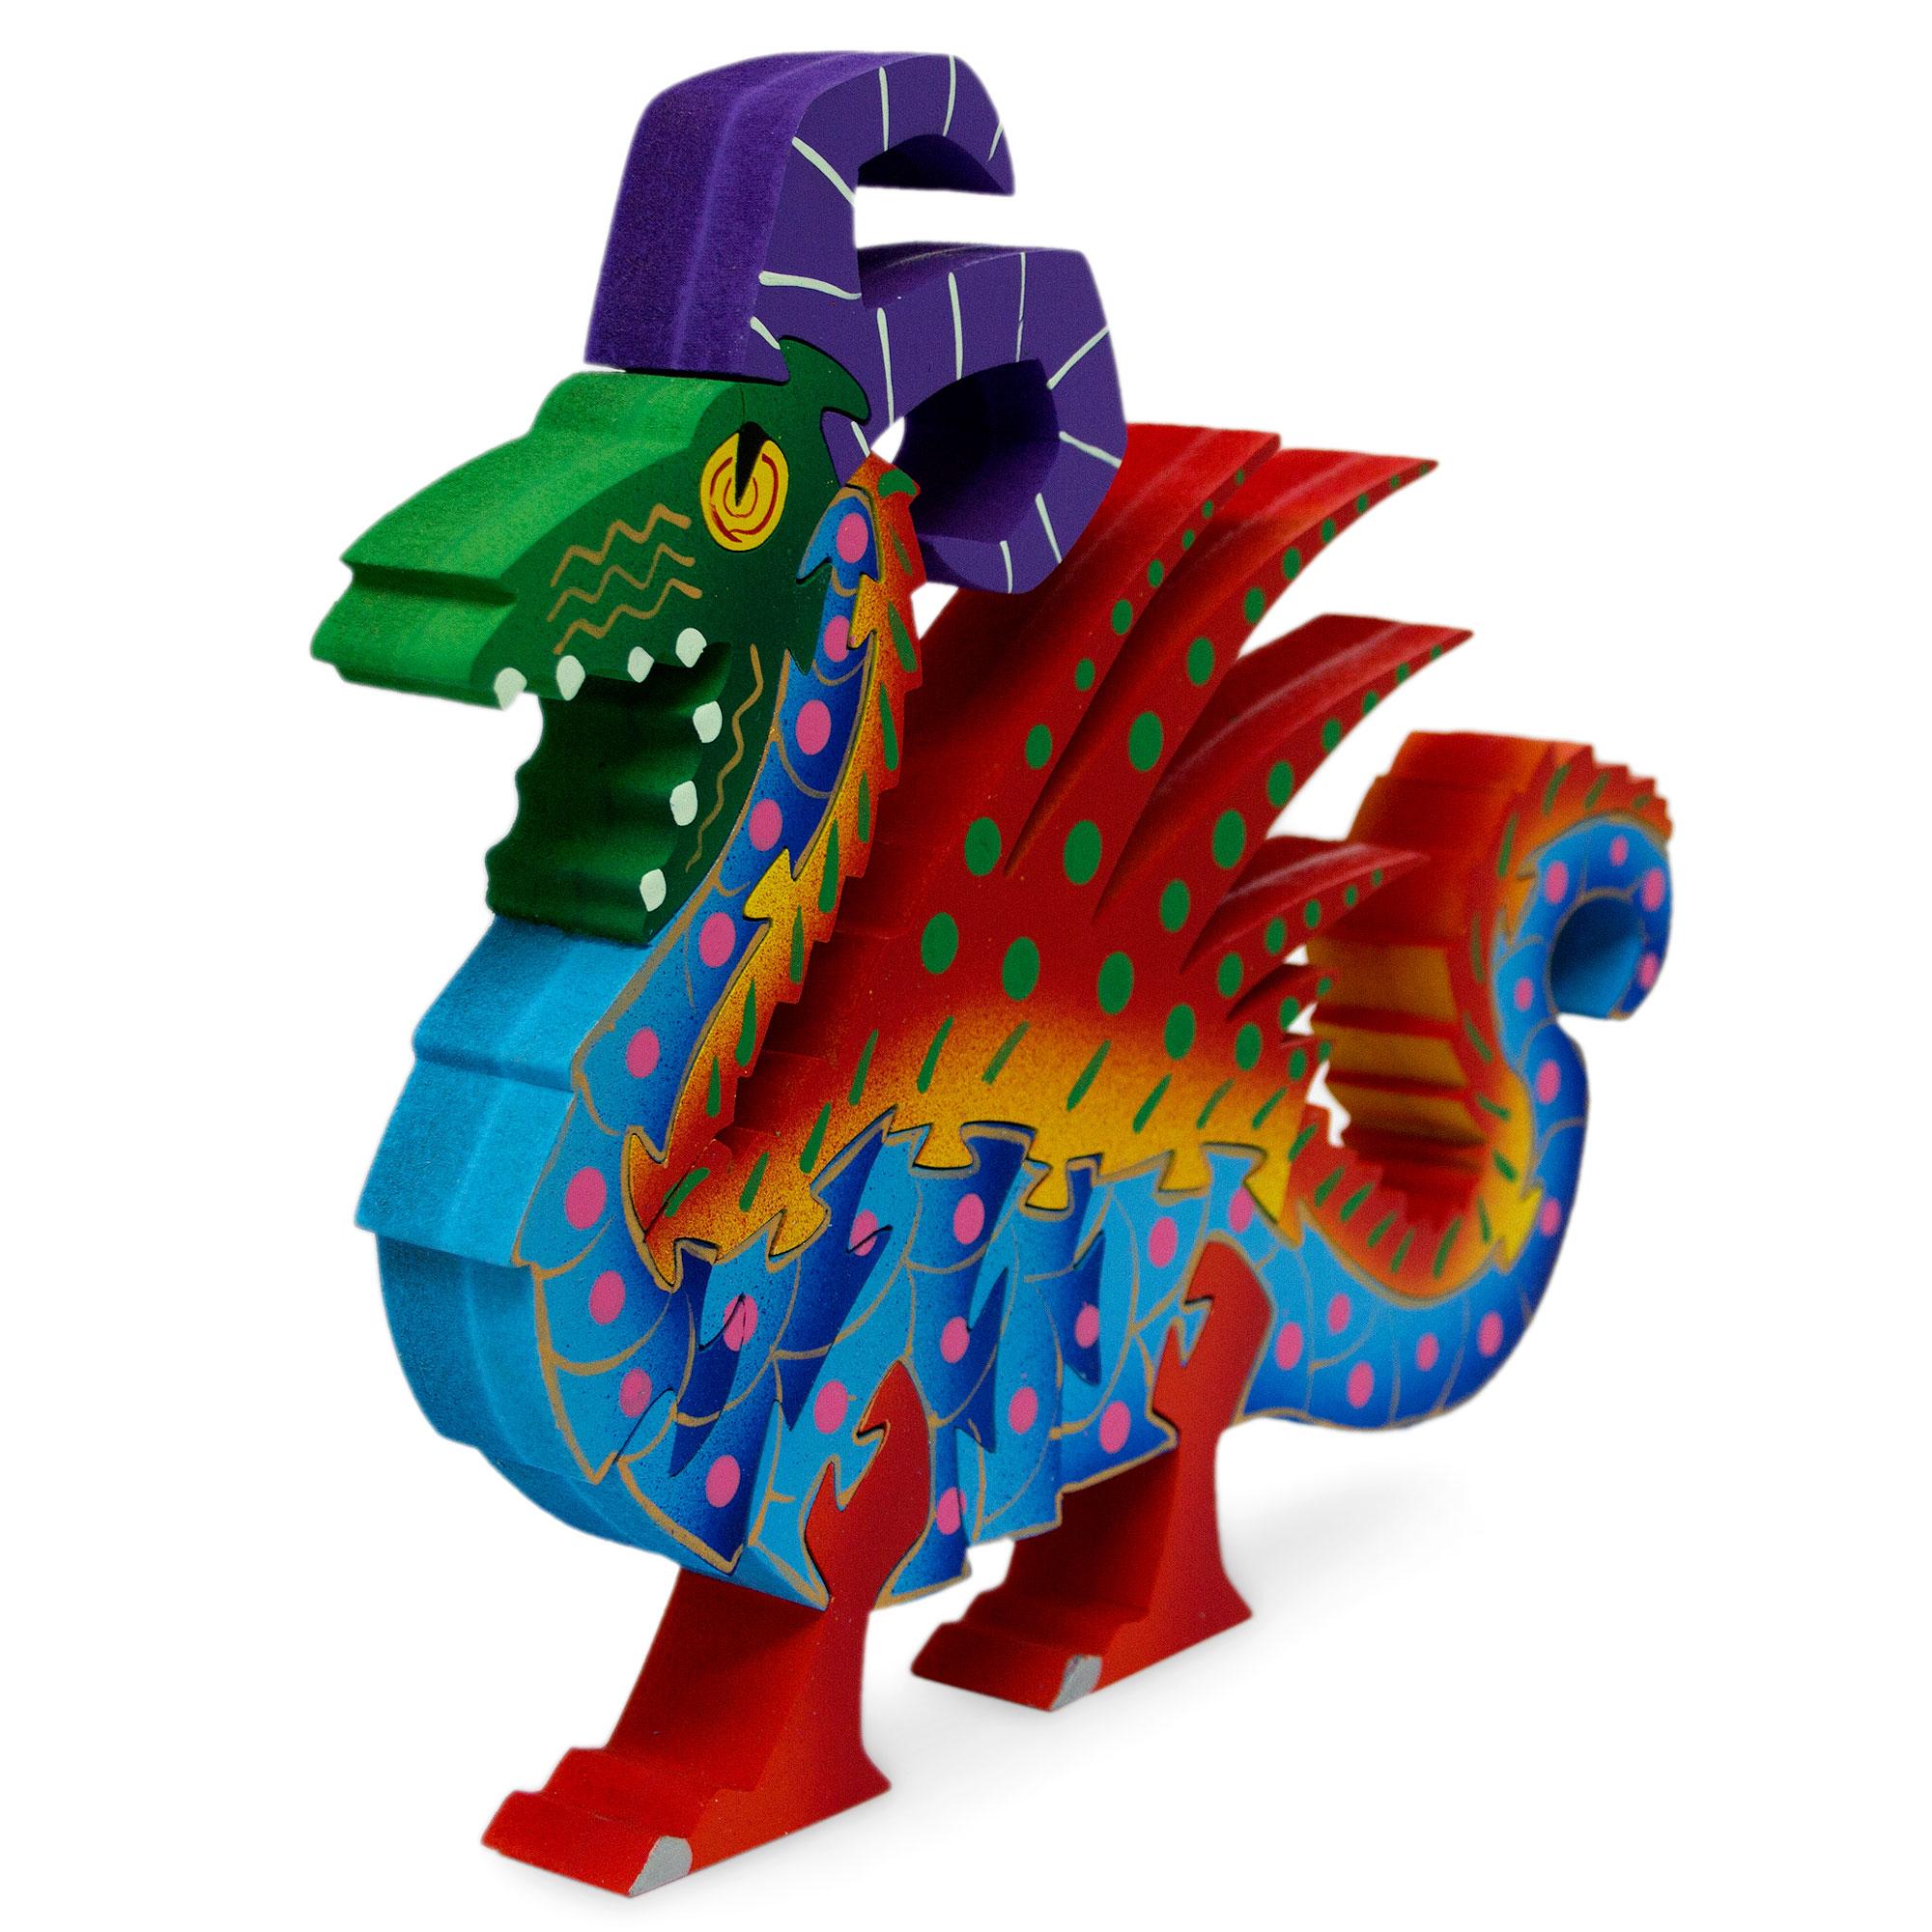 Wood display jigsaw puzzle, 'Mischievous Dragon'